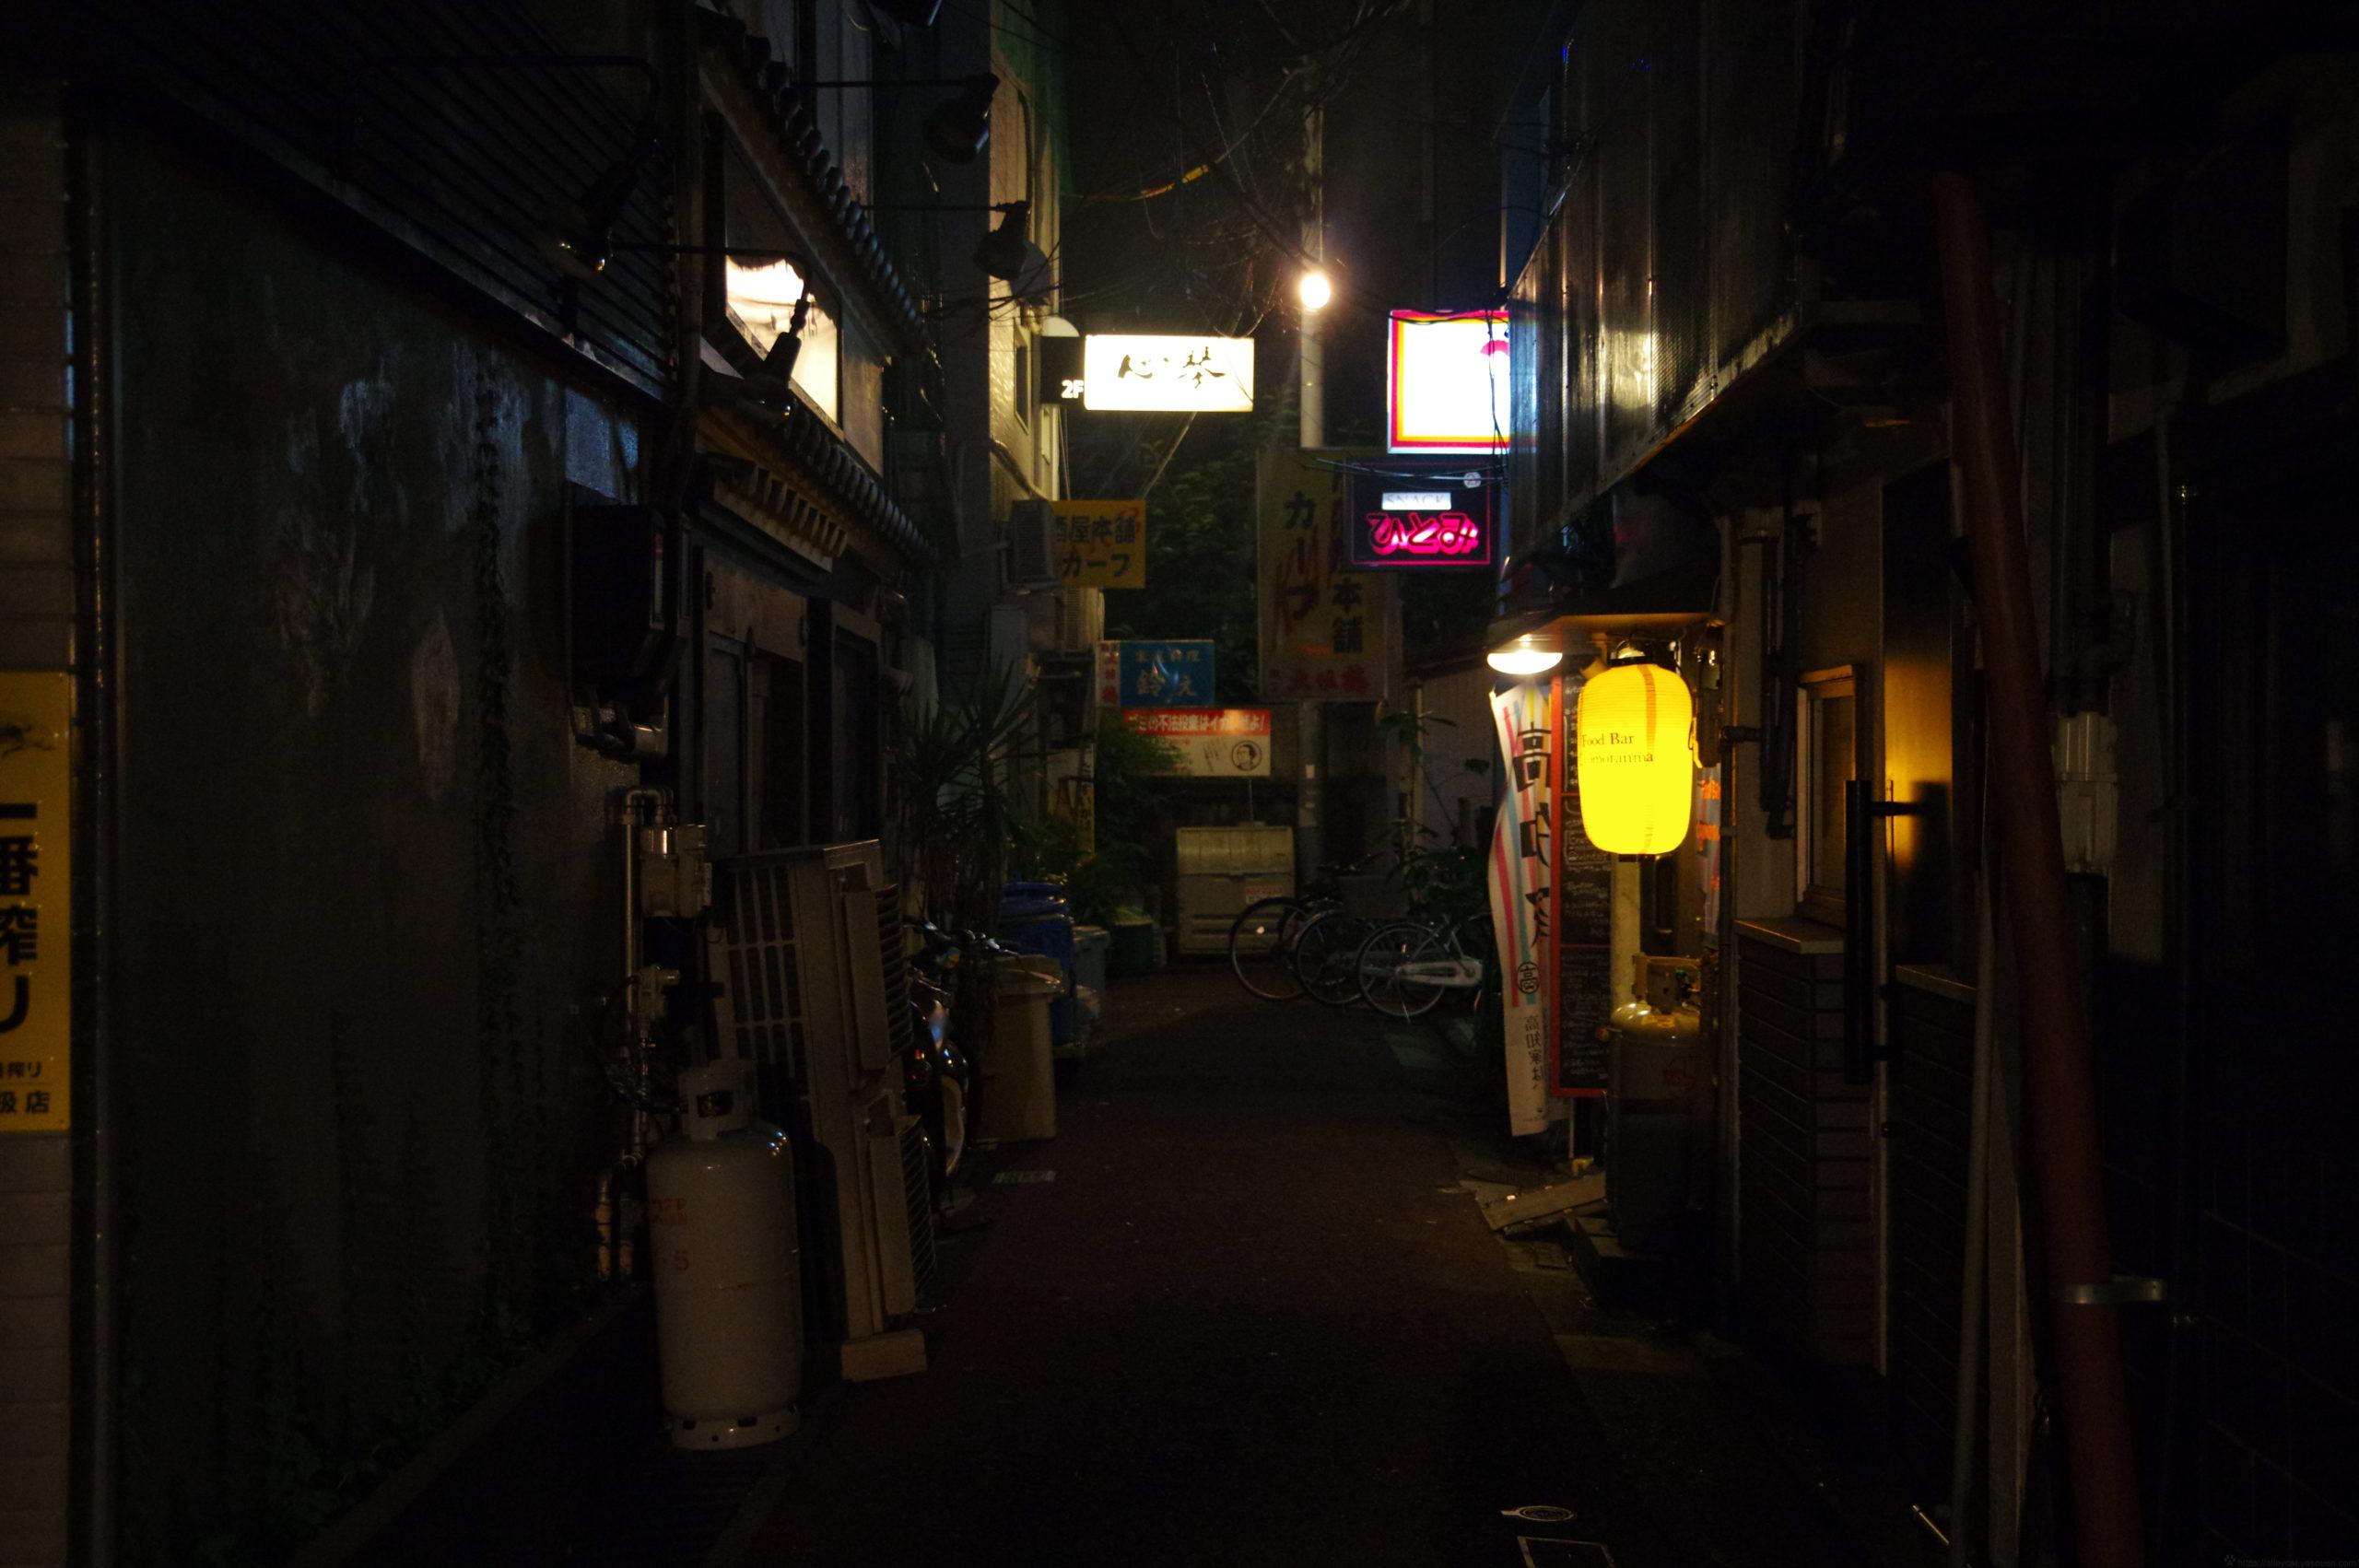 Shikoku, Japan, 2018